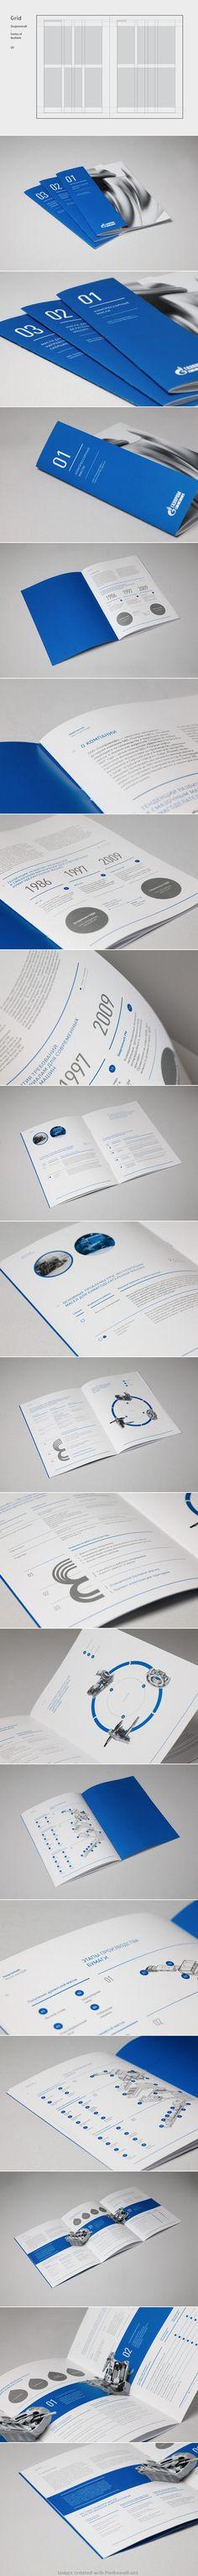 Gazpromneft booklets